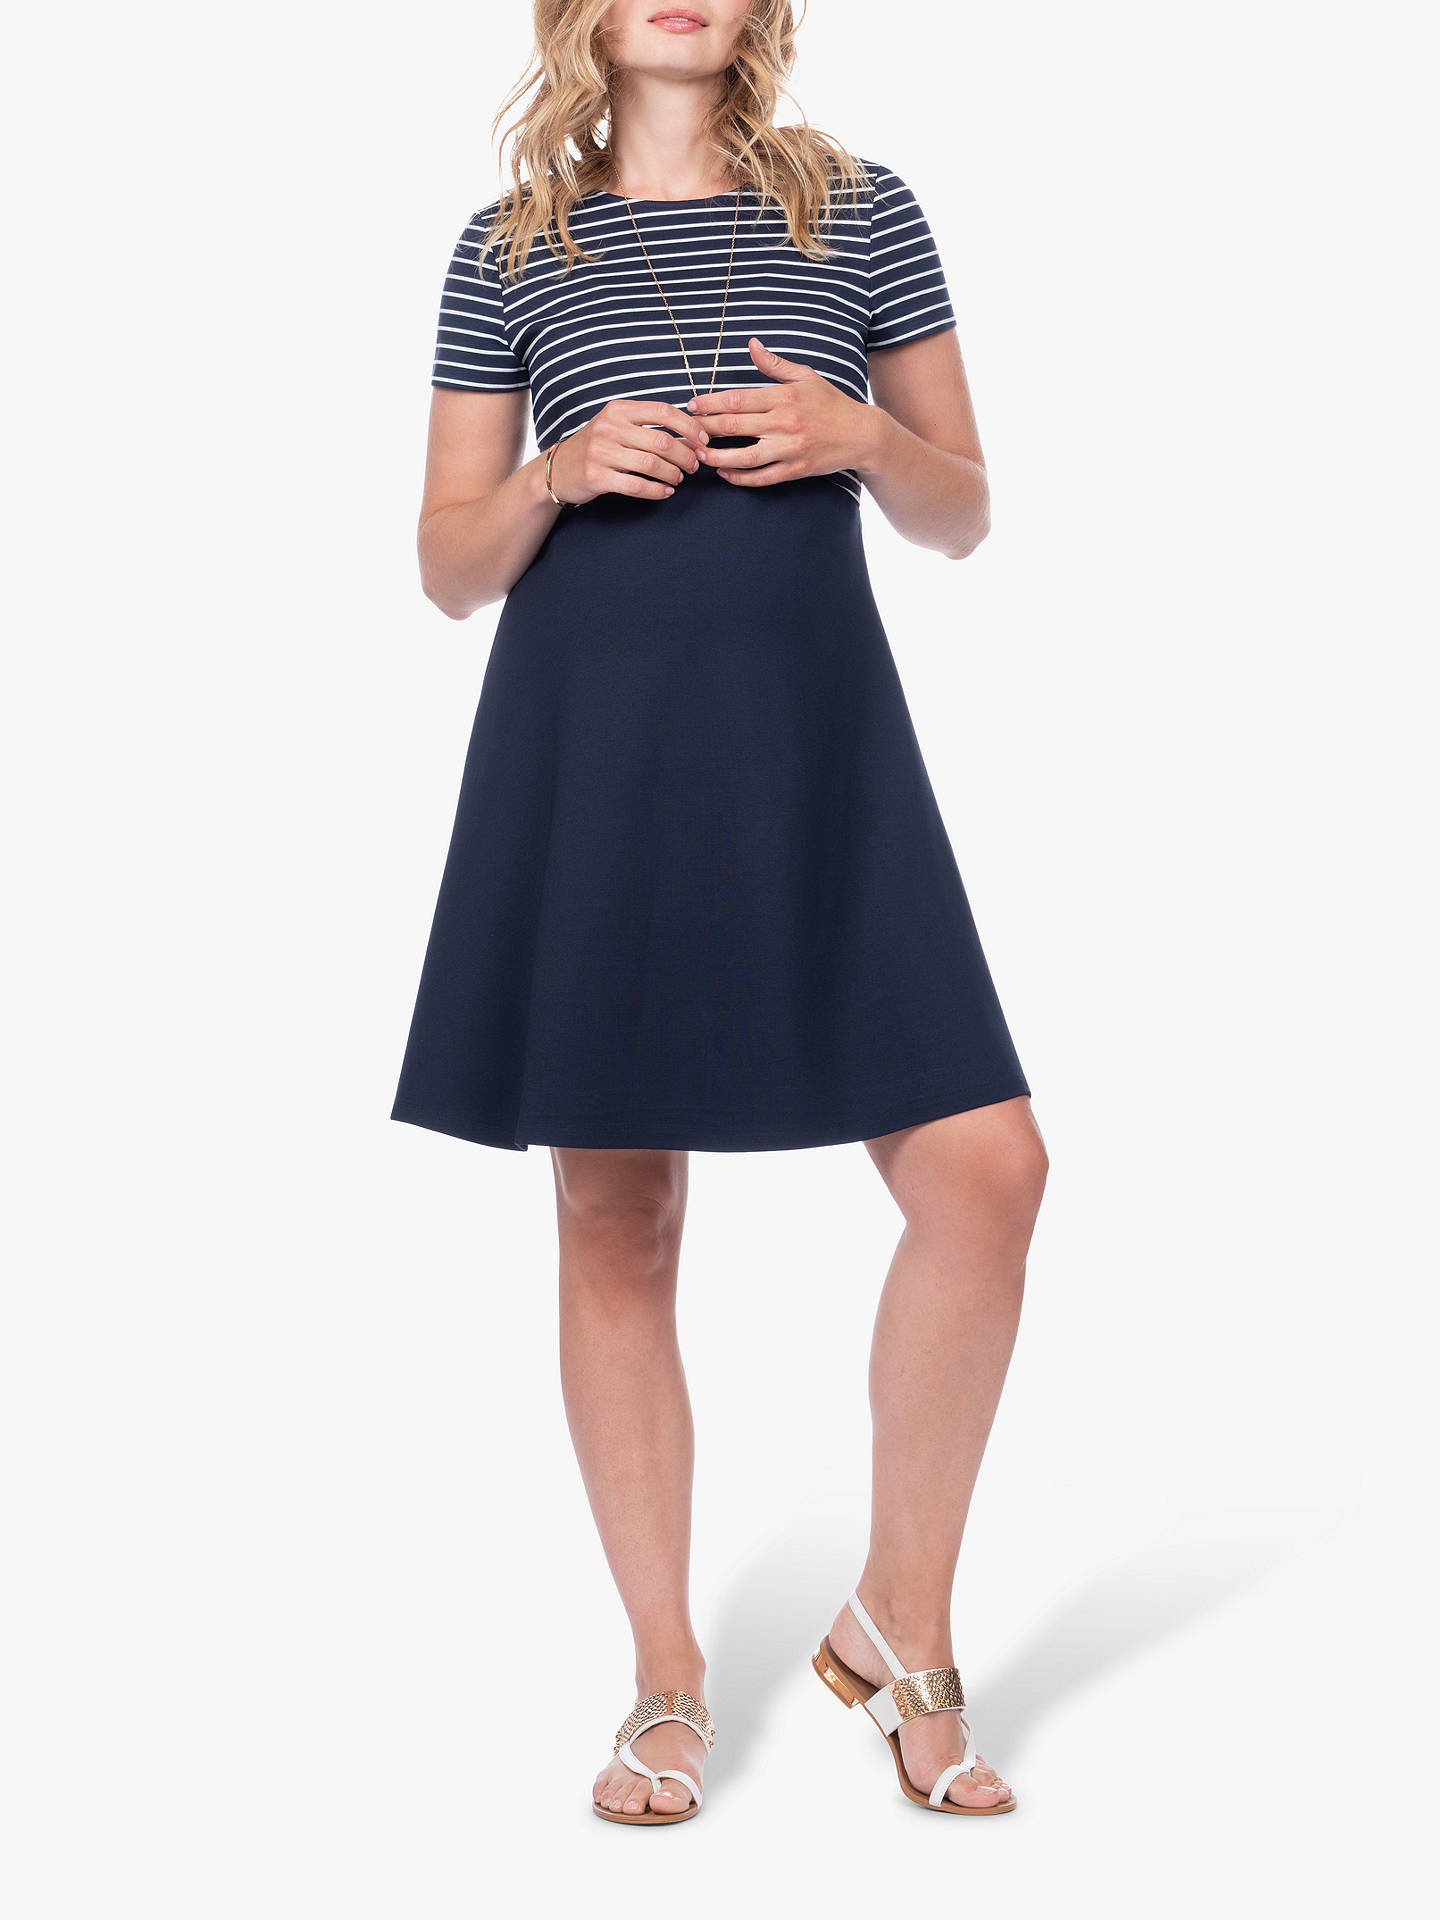 d9fe9b60285 ... Buy Séraphine Bethany Maternity Dress